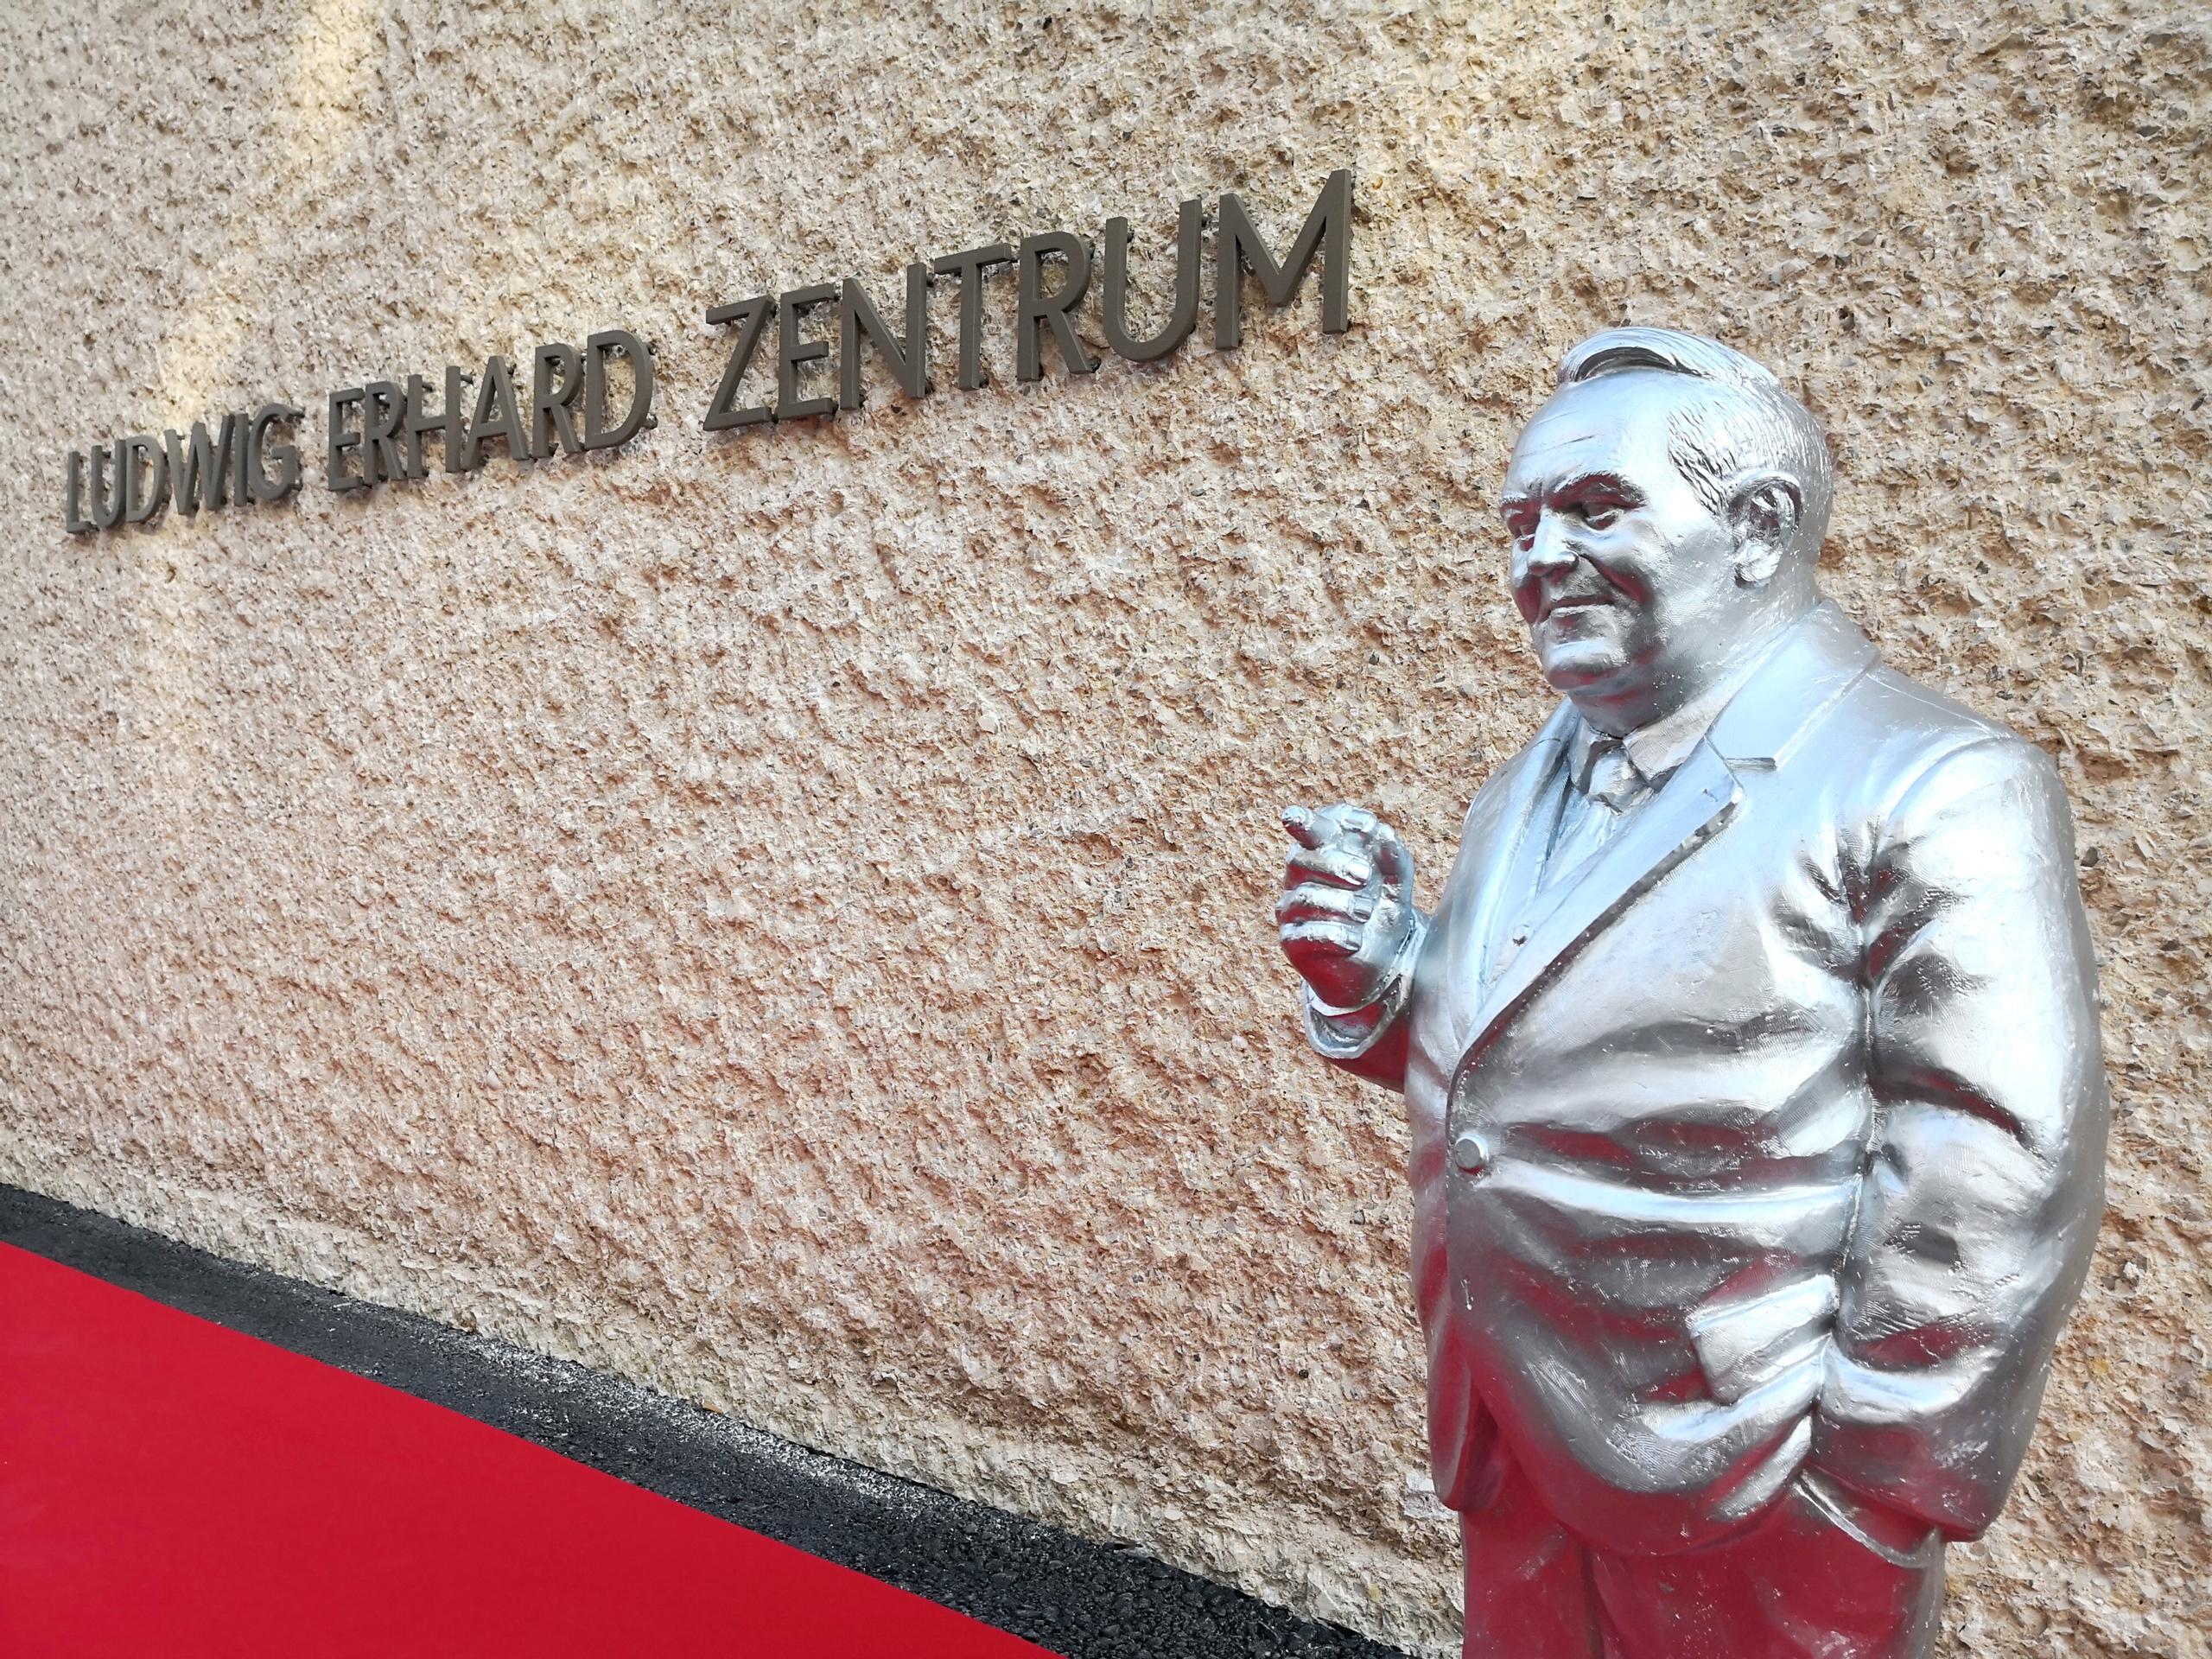 Ludwig Erhard Zentrum